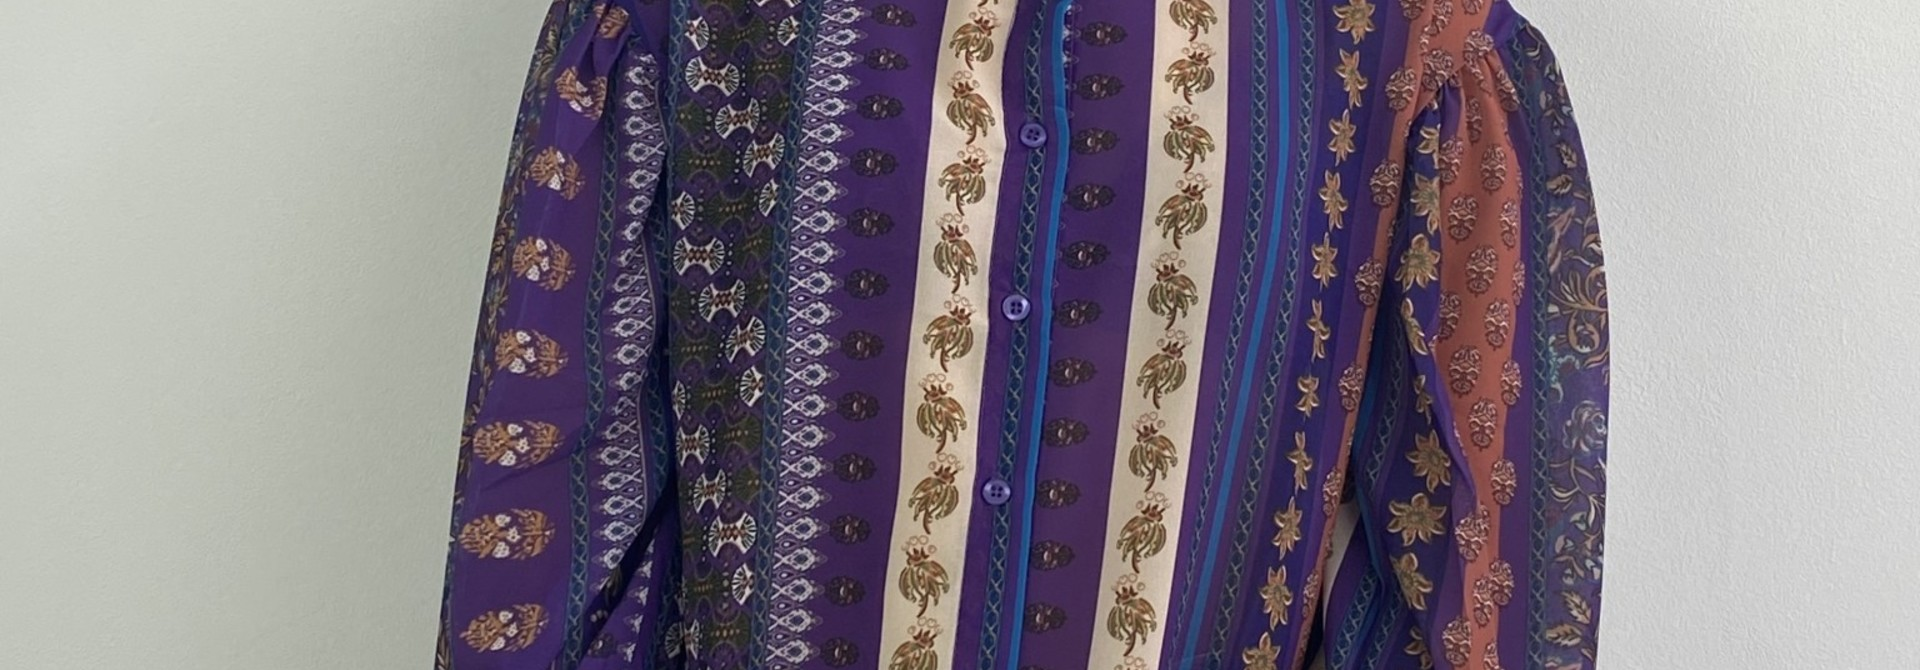 Faith ballonsleeve blouse Fleuri Violet